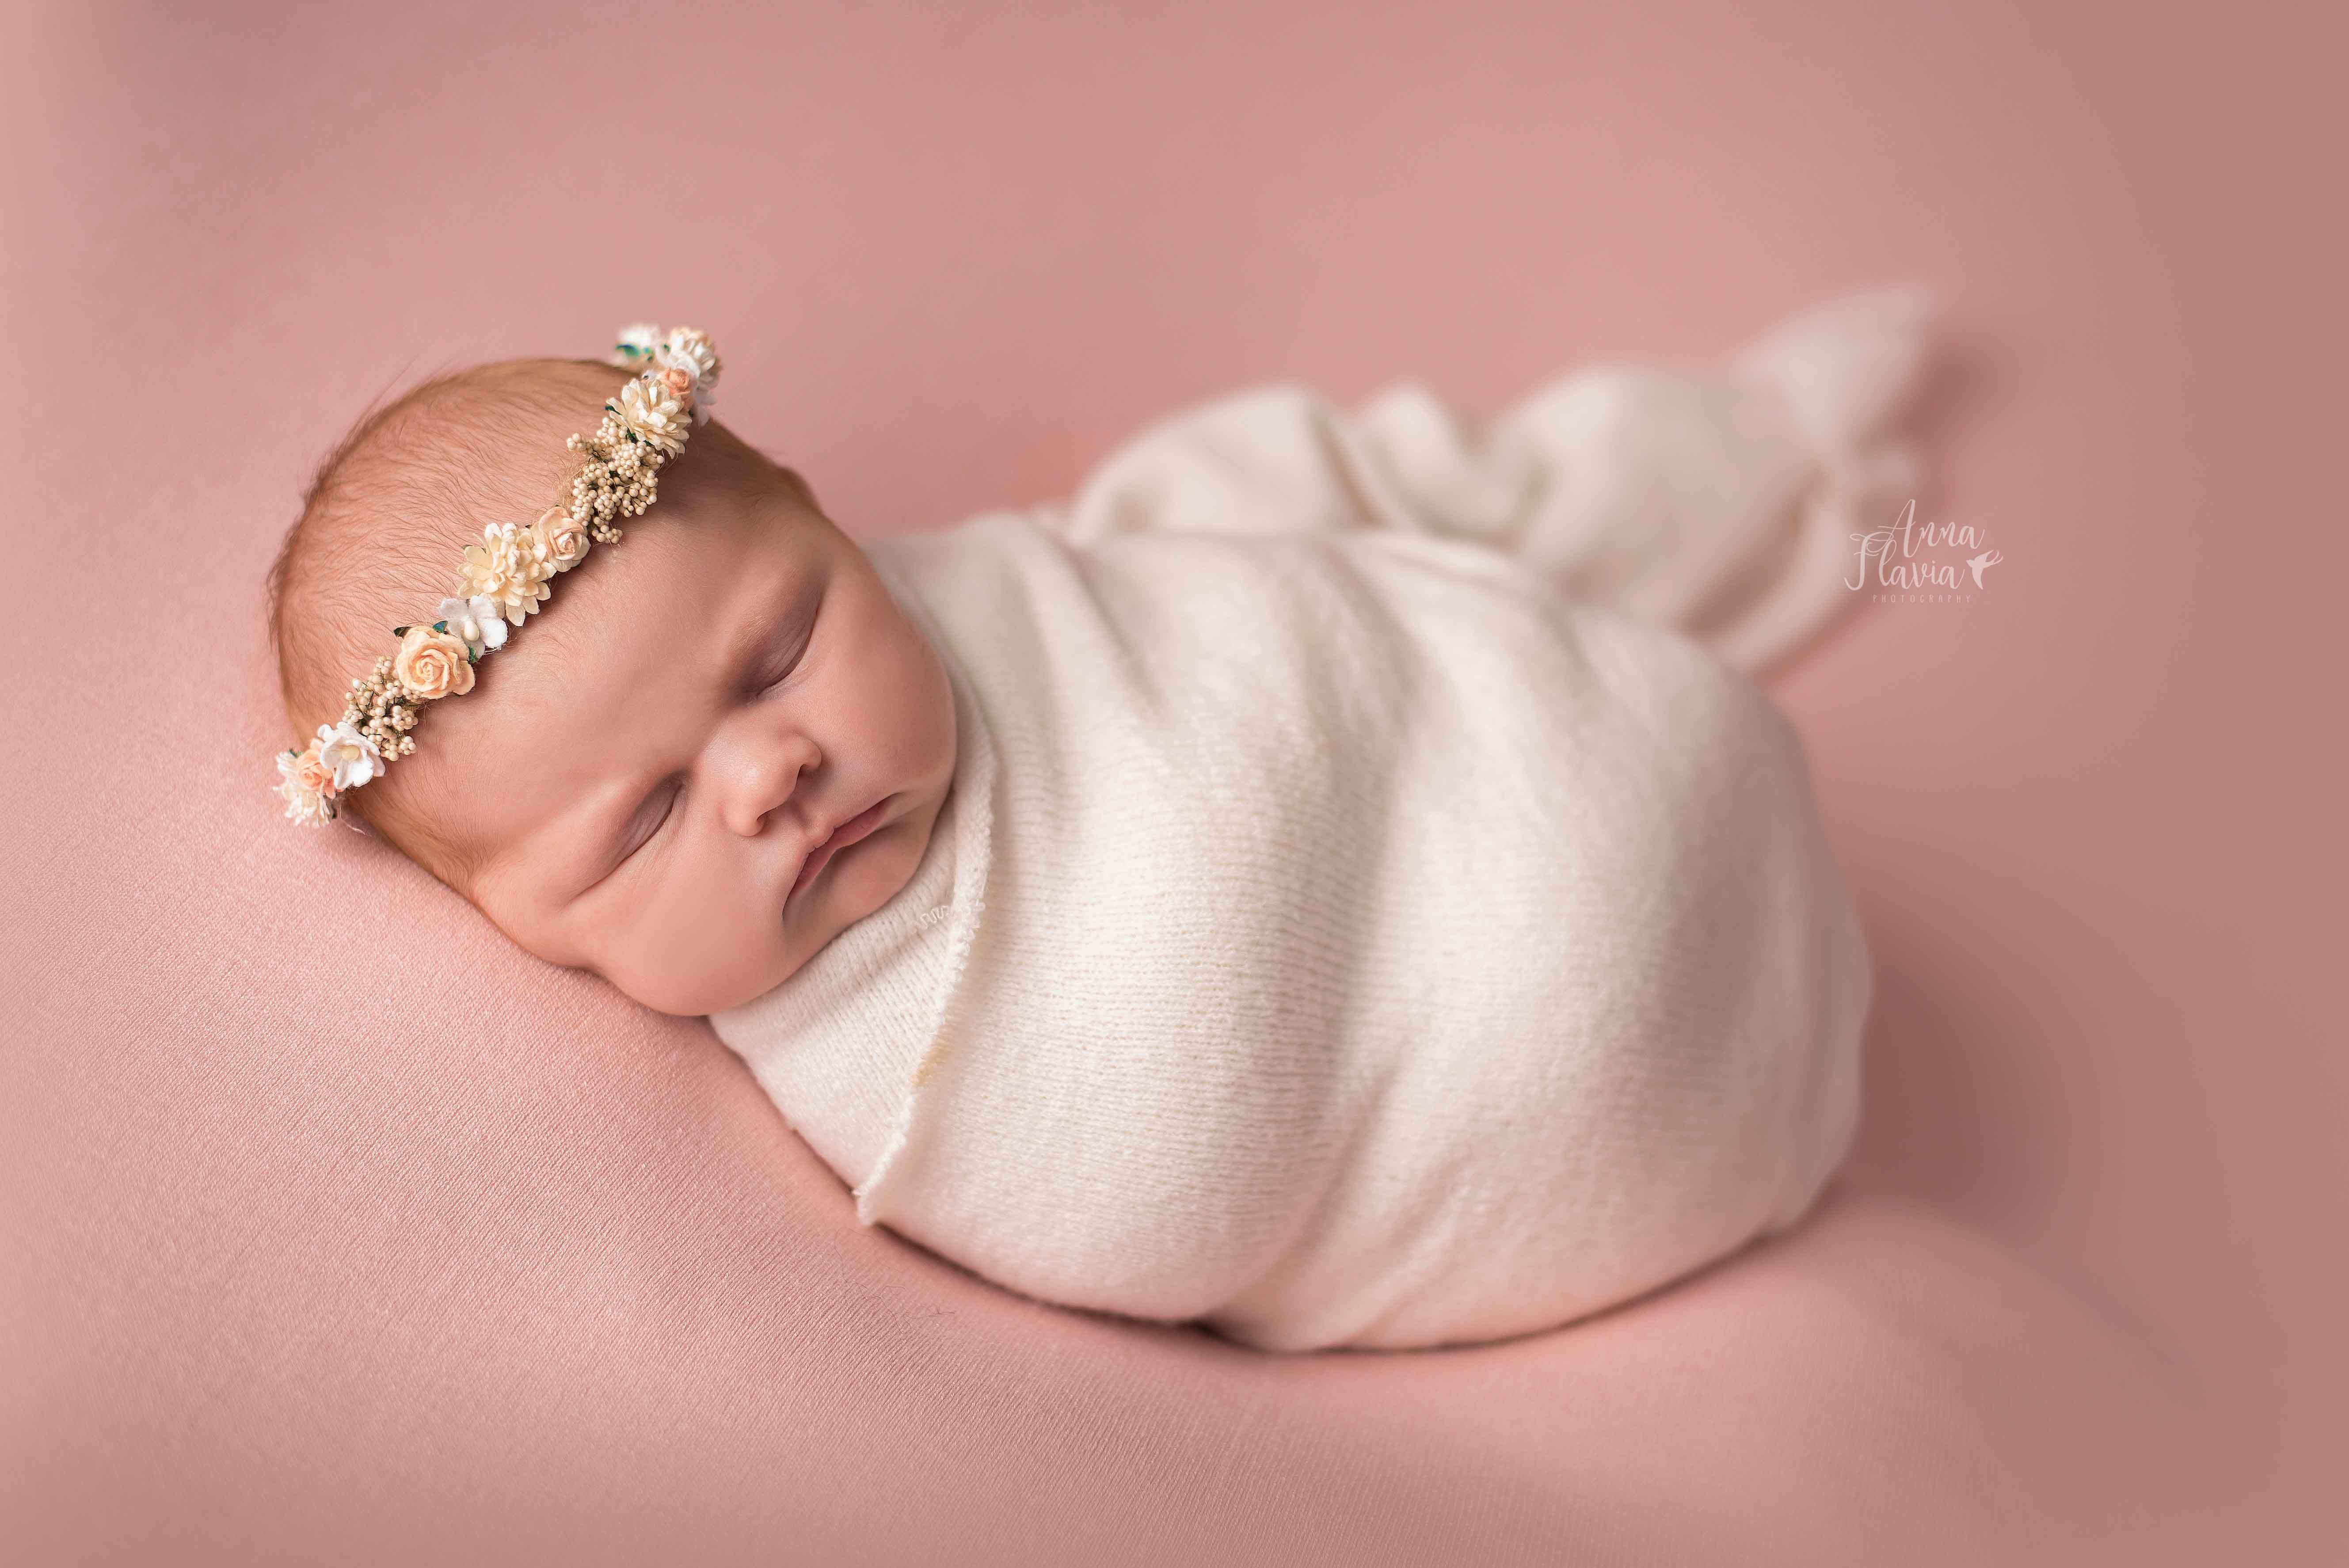 photographer_dublin_anna_flavia_newborn_maternity_24